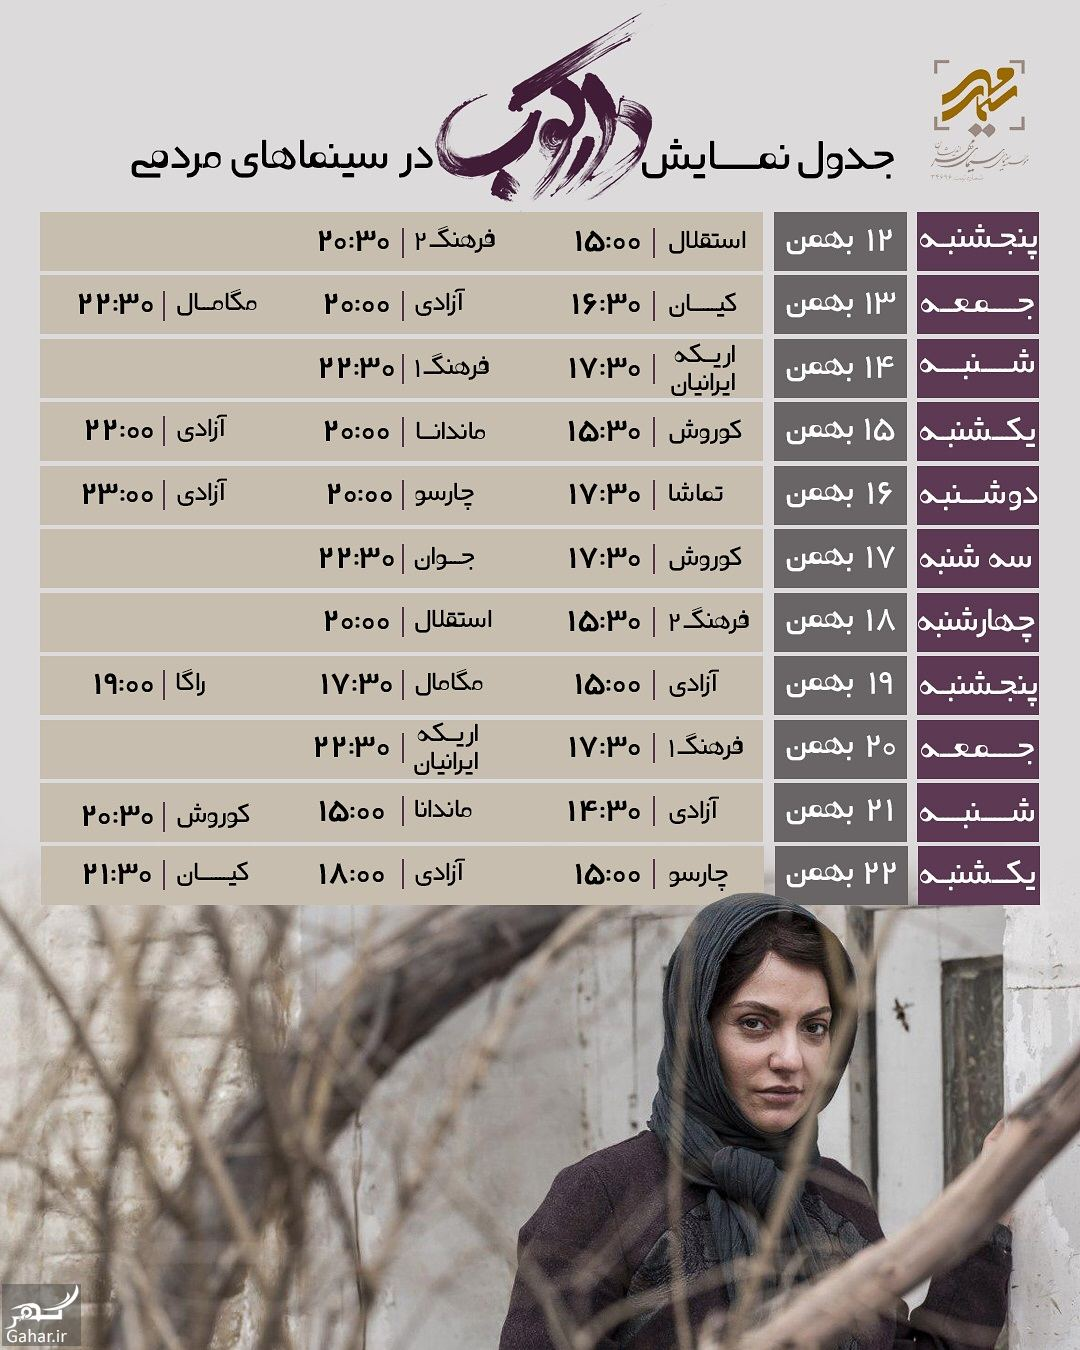 654954 Gahar ir برنامه نمایش فیلم دارکوب در سینماهای مردمی